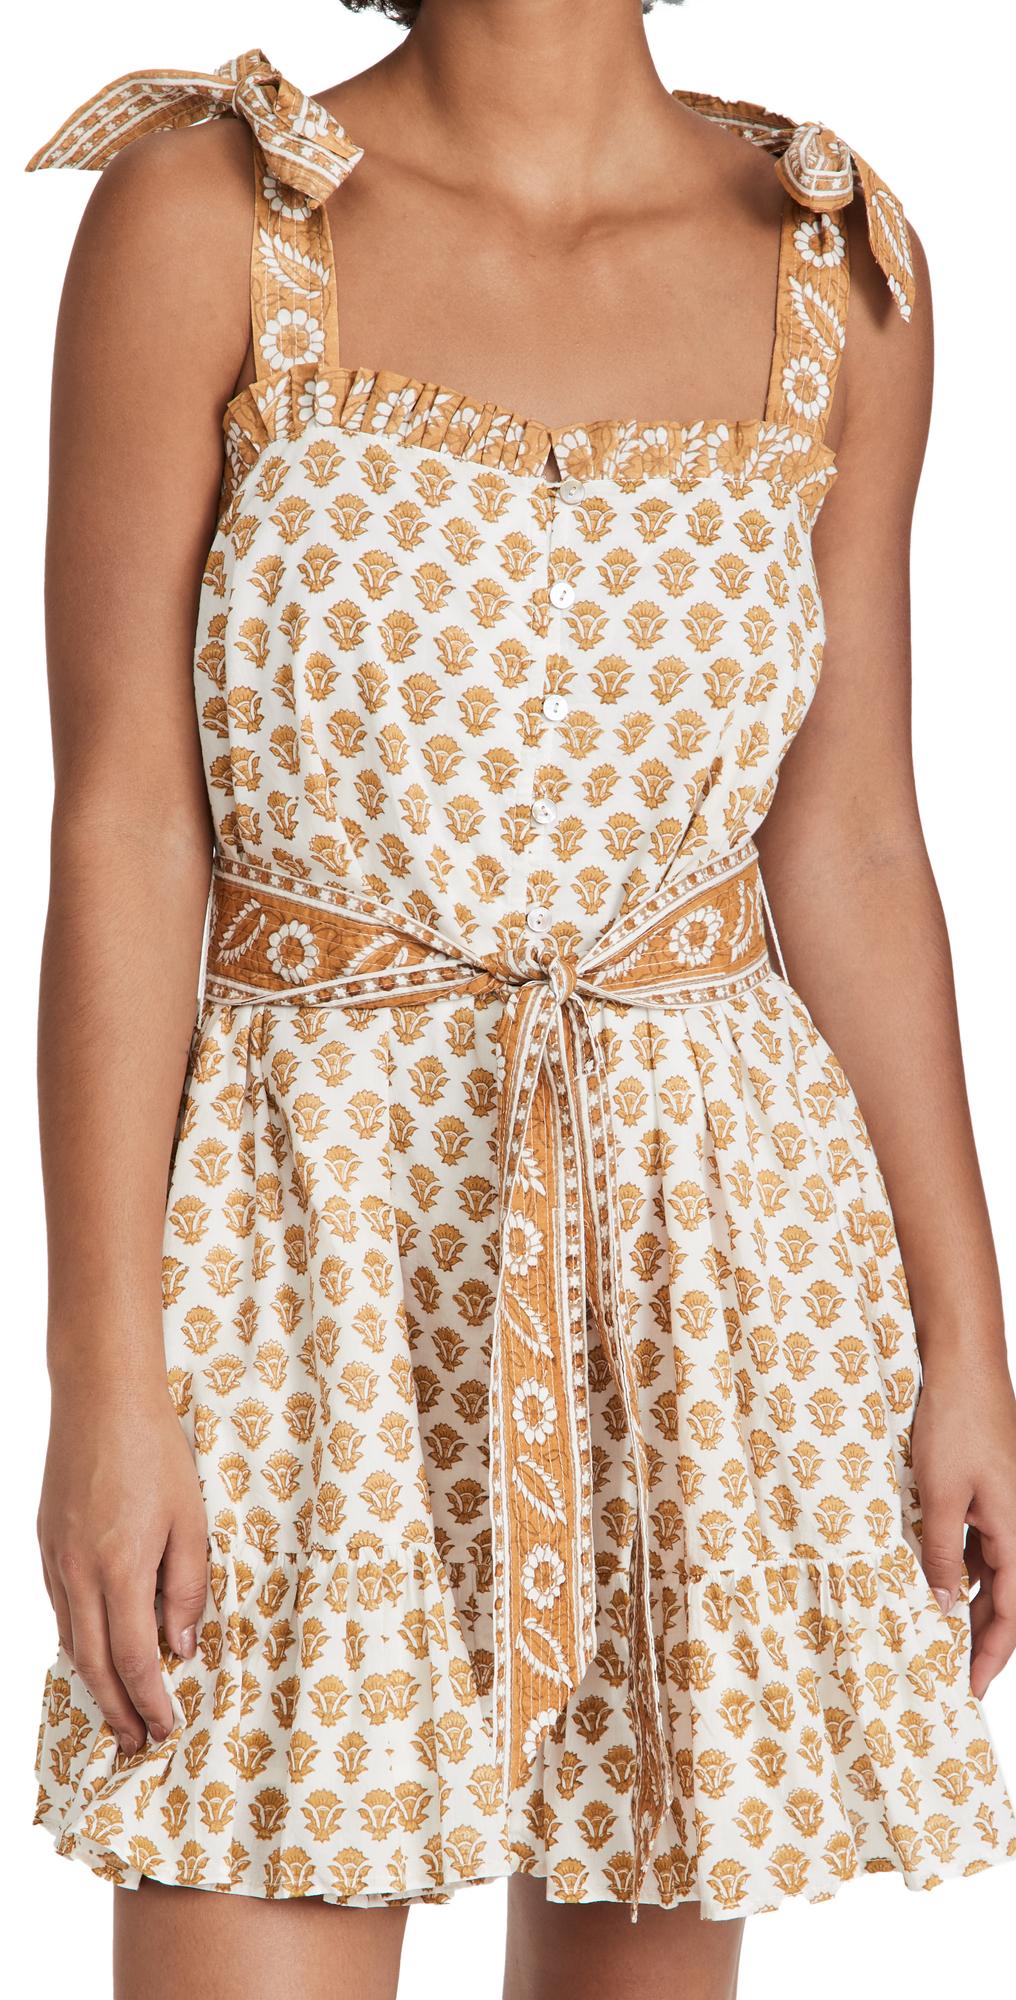 Tillie Mini Dress